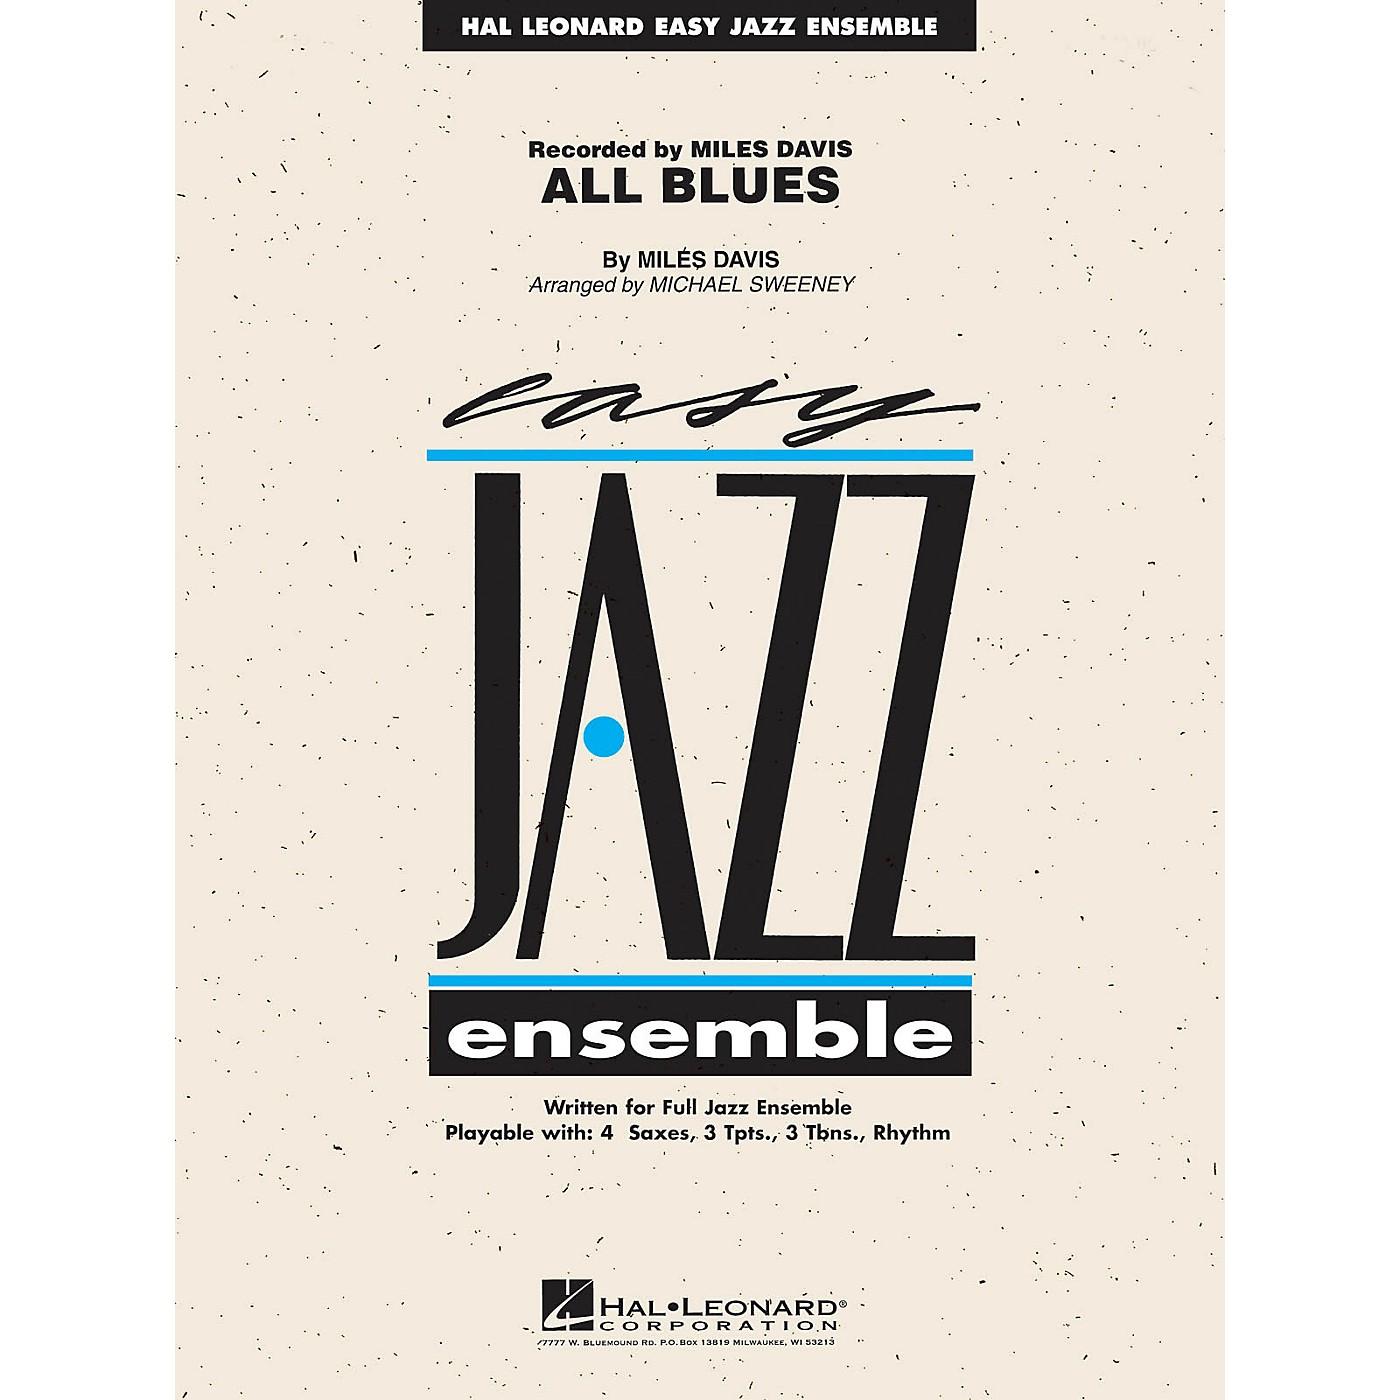 Hal Leonard All Blues Jazz Band Level 2 Arranged by Michael Sweeney thumbnail